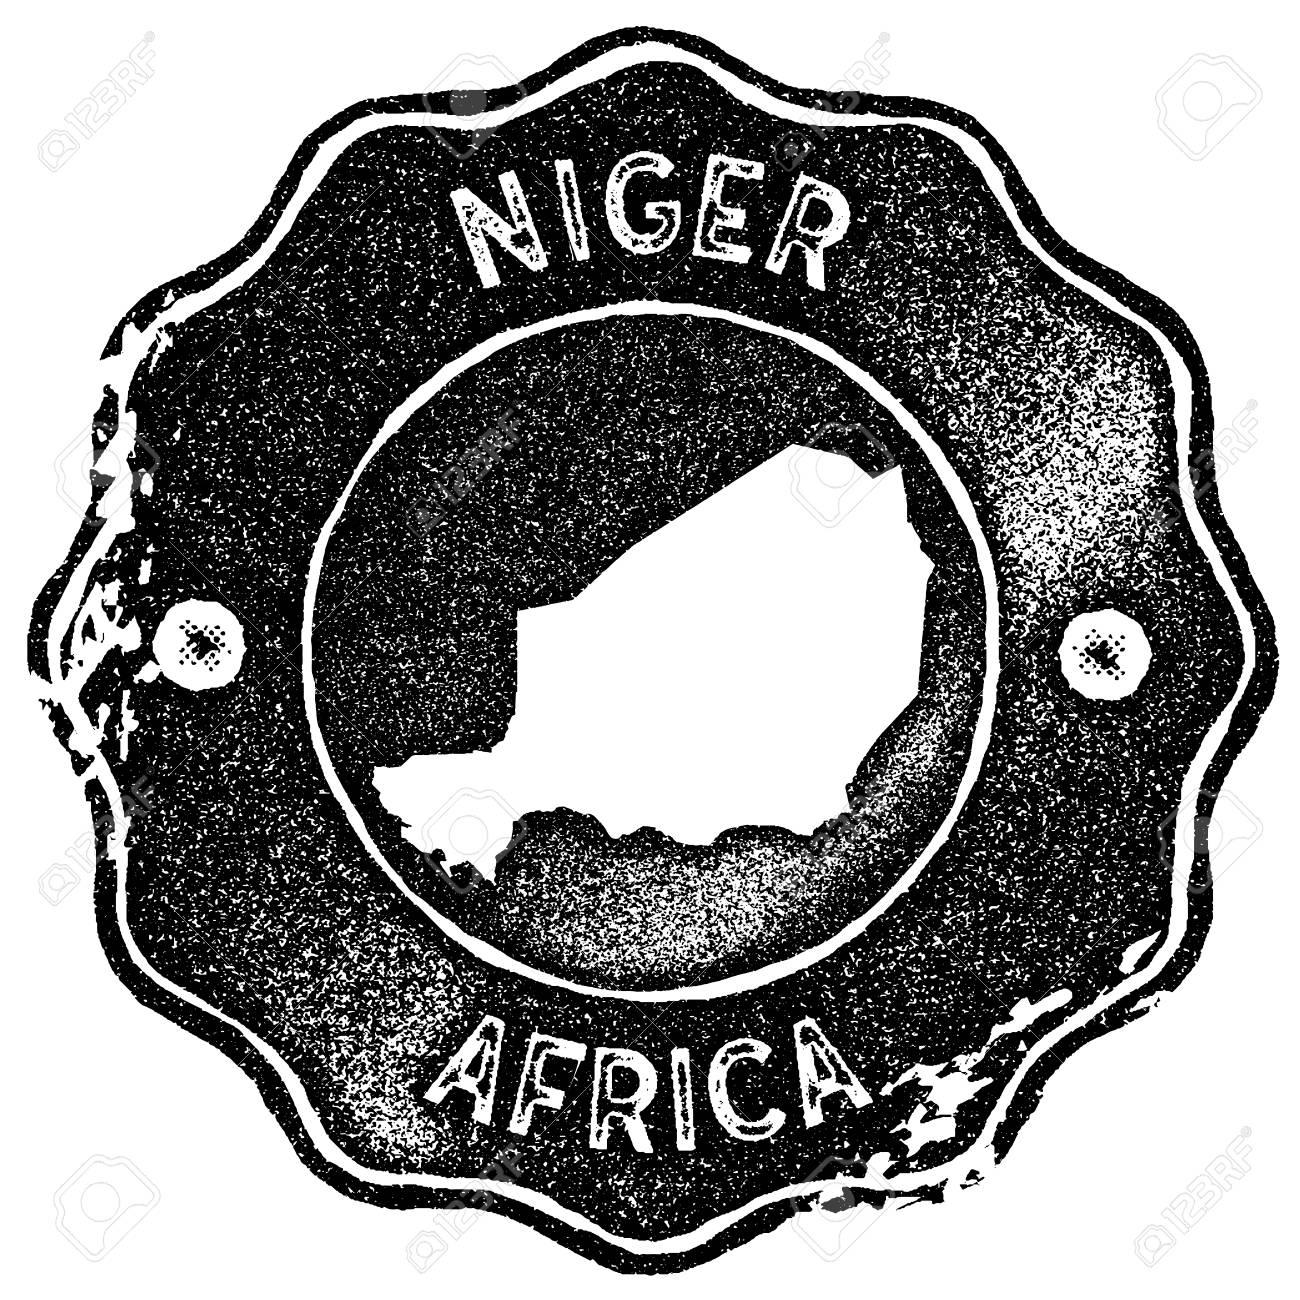 niger map vintage st retro style handmade label badge or Niger Map Zone niger map vintage st retro style handmade label badge or element for travel souvenirs